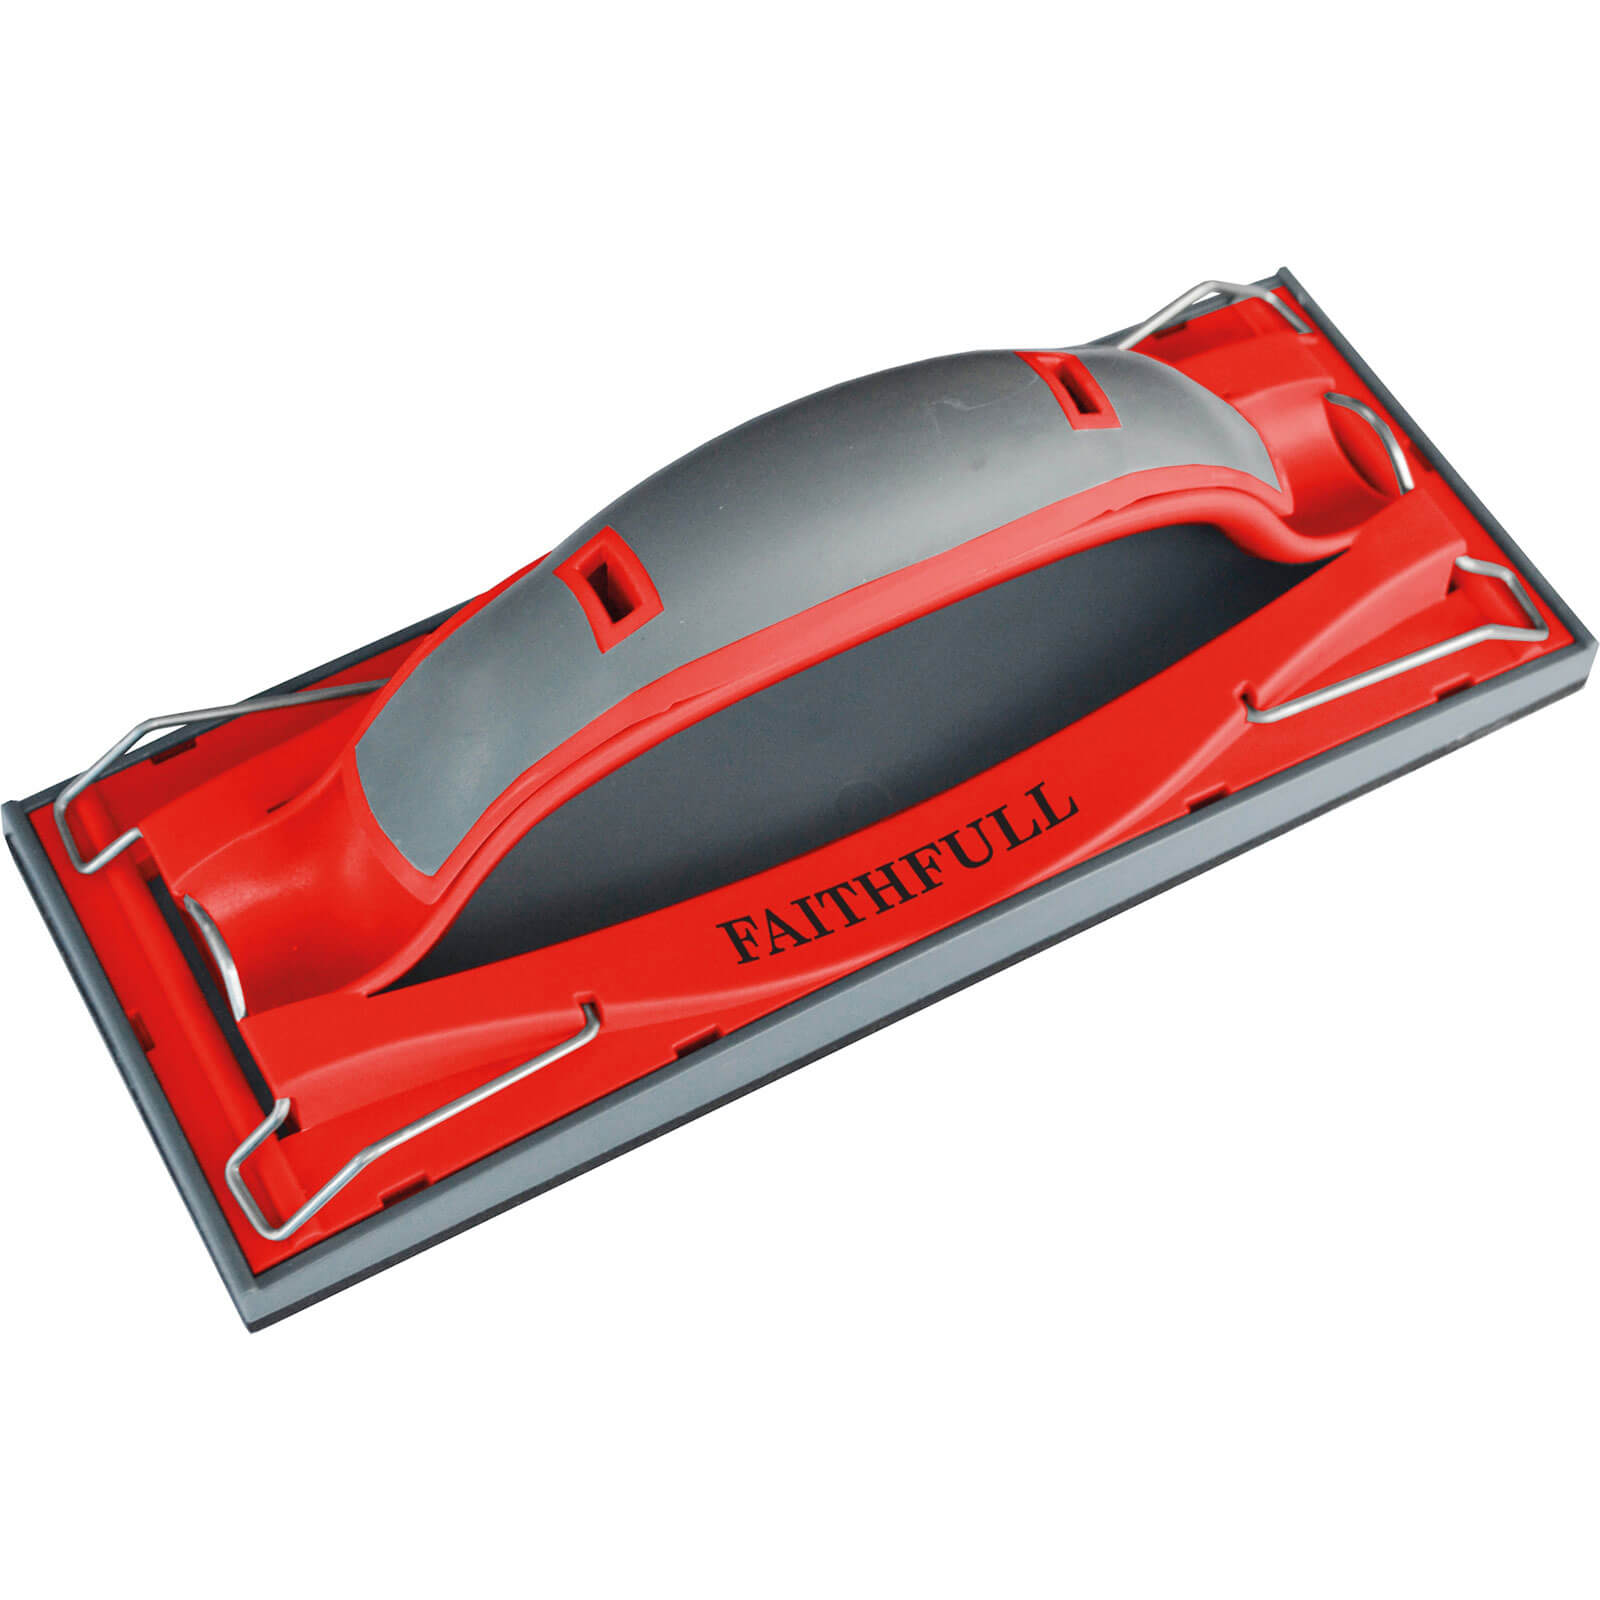 Image of Faithfull Drywall Quick Grip Hand Sander